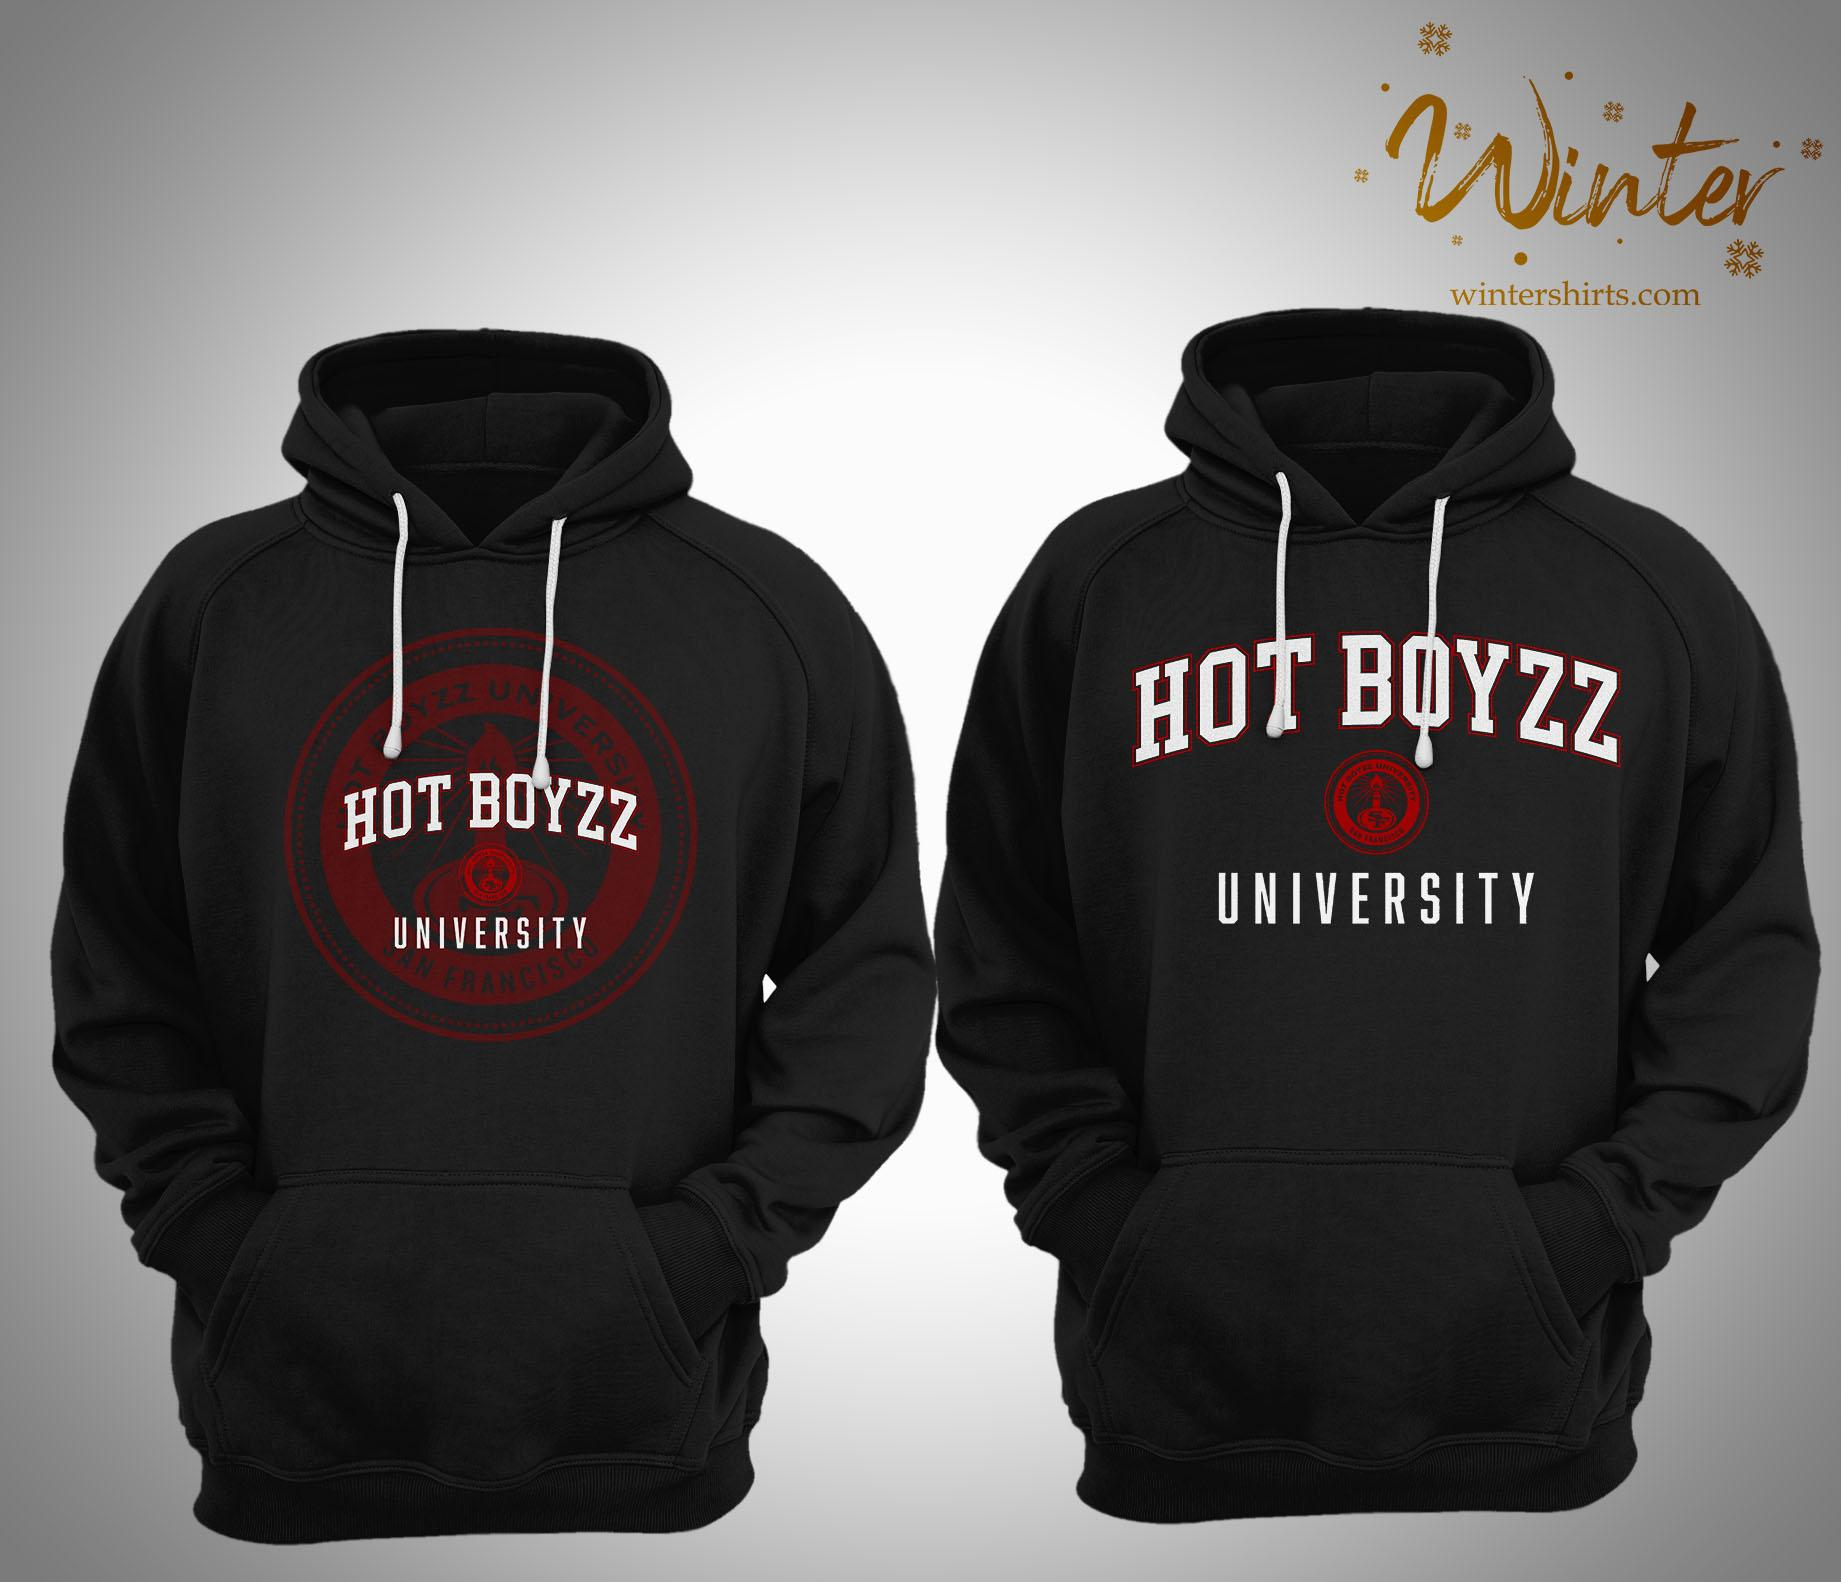 San Francisco 49ers Hot Boyzz University Hoodie